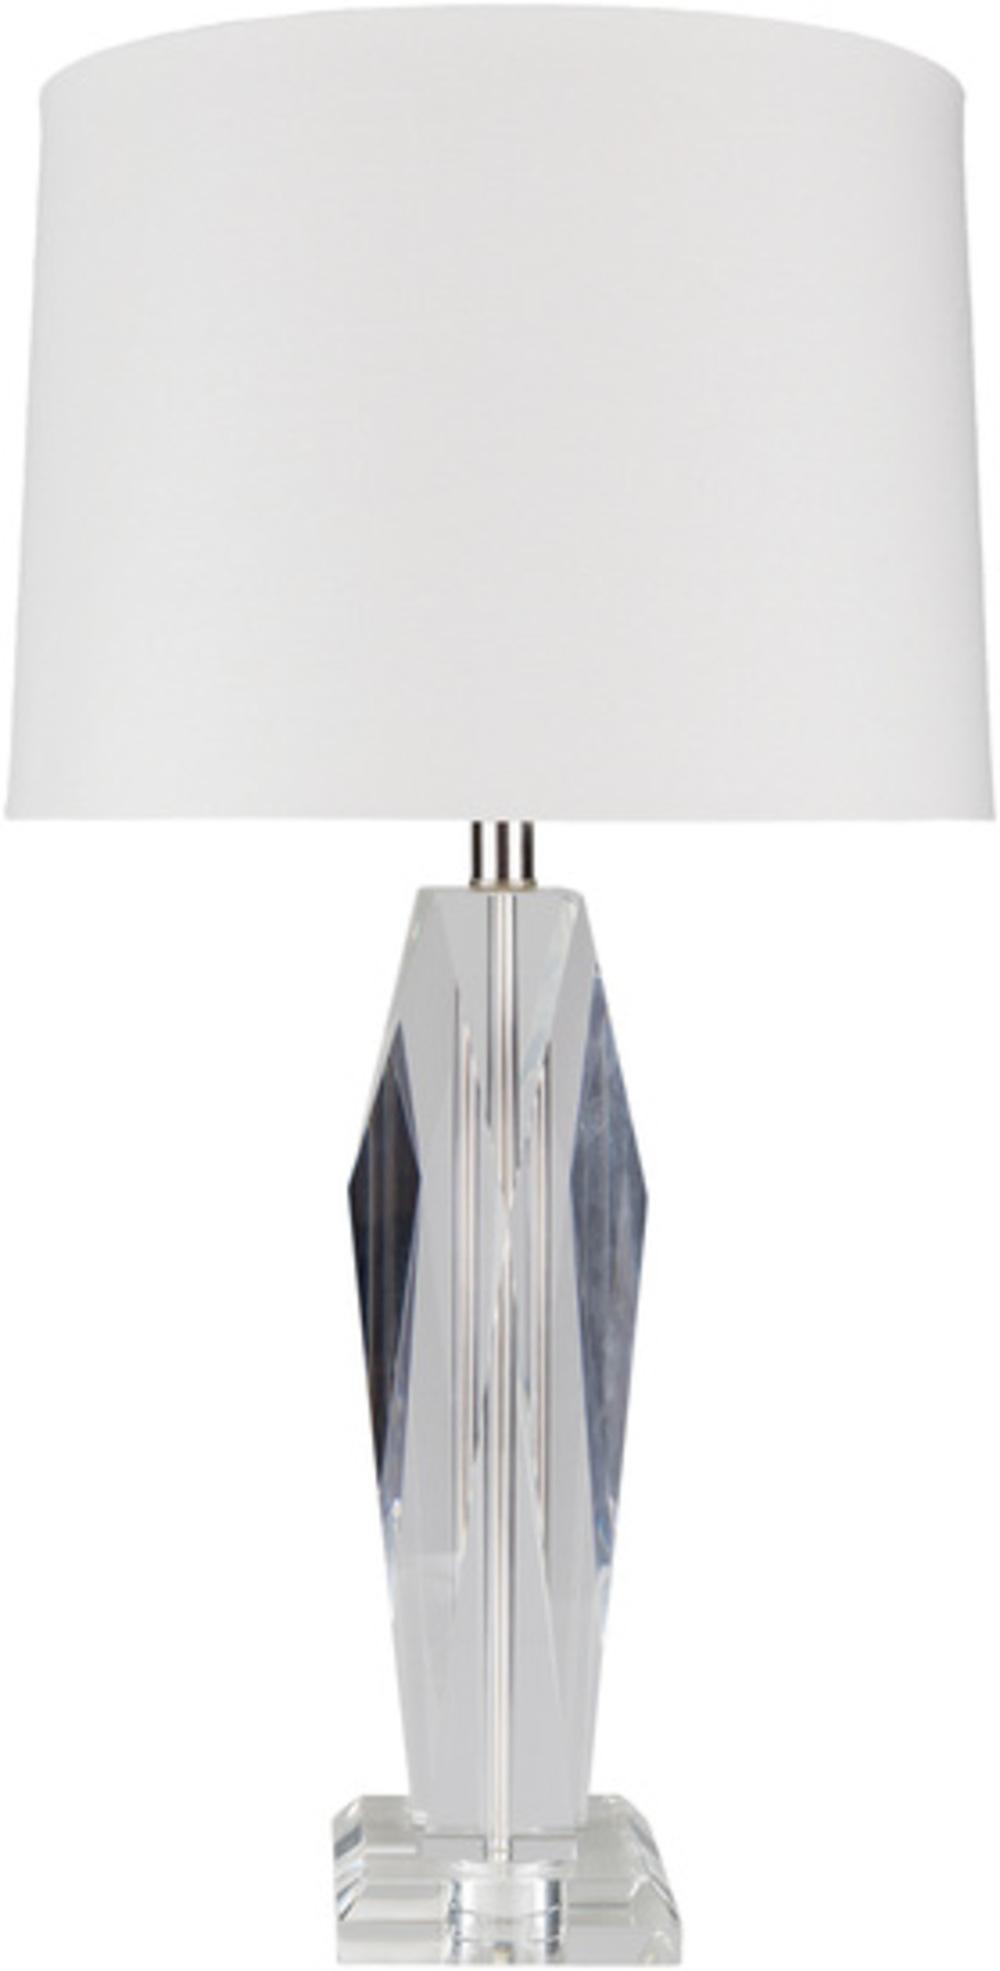 Surya - Novak Table Lamp